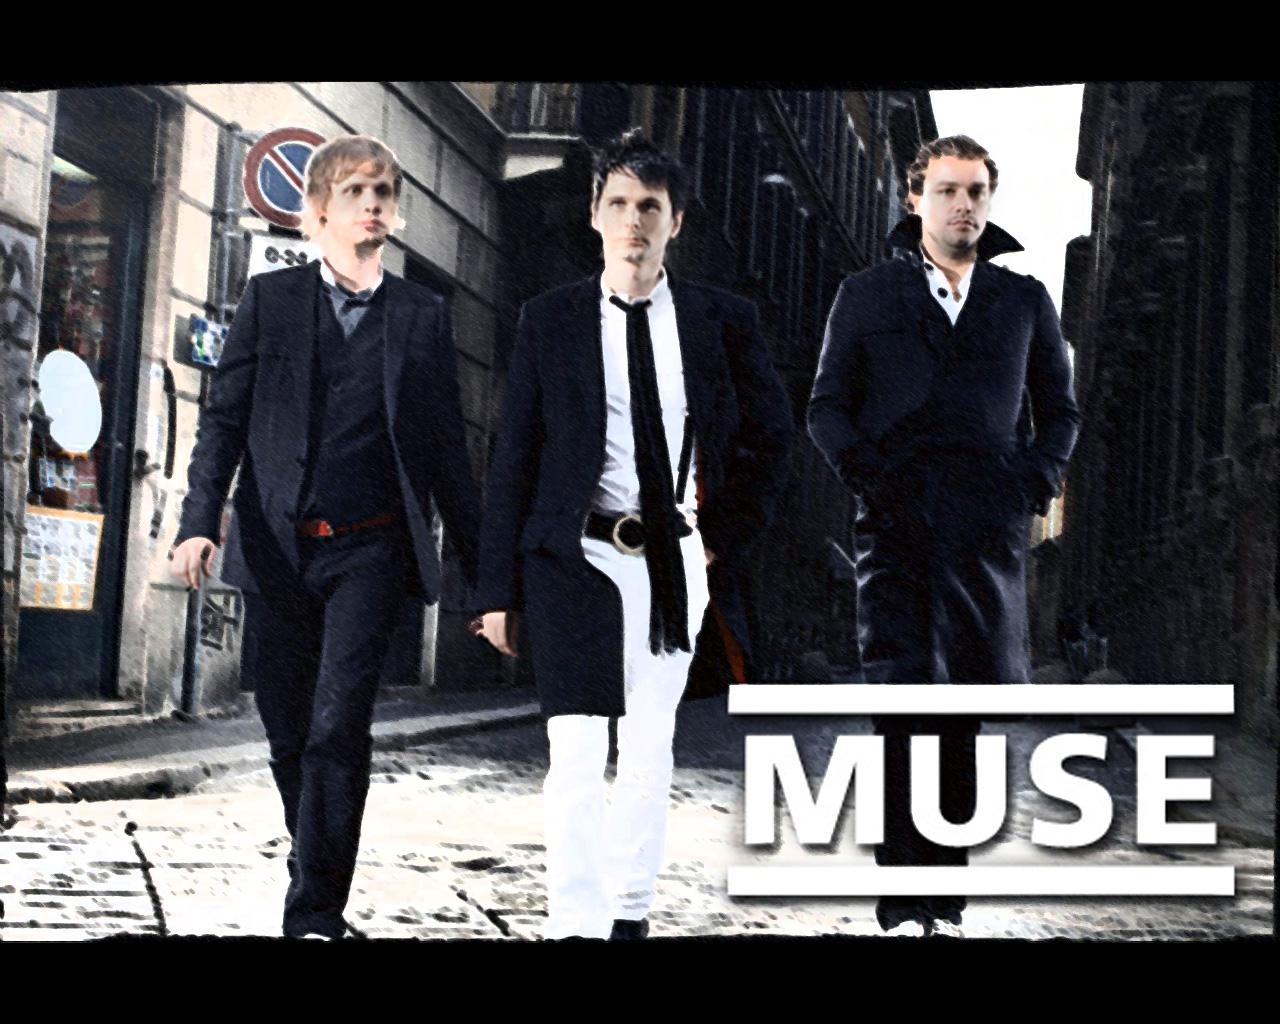 http://3.bp.blogspot.com/-MGVPBsWw8Ek/TtY46iVA40I/AAAAAAAAAxs/w7a4_qiNRrs/s1600/music_muse_bands_desktop_1280x1024_wallpaper-116078.jpeg